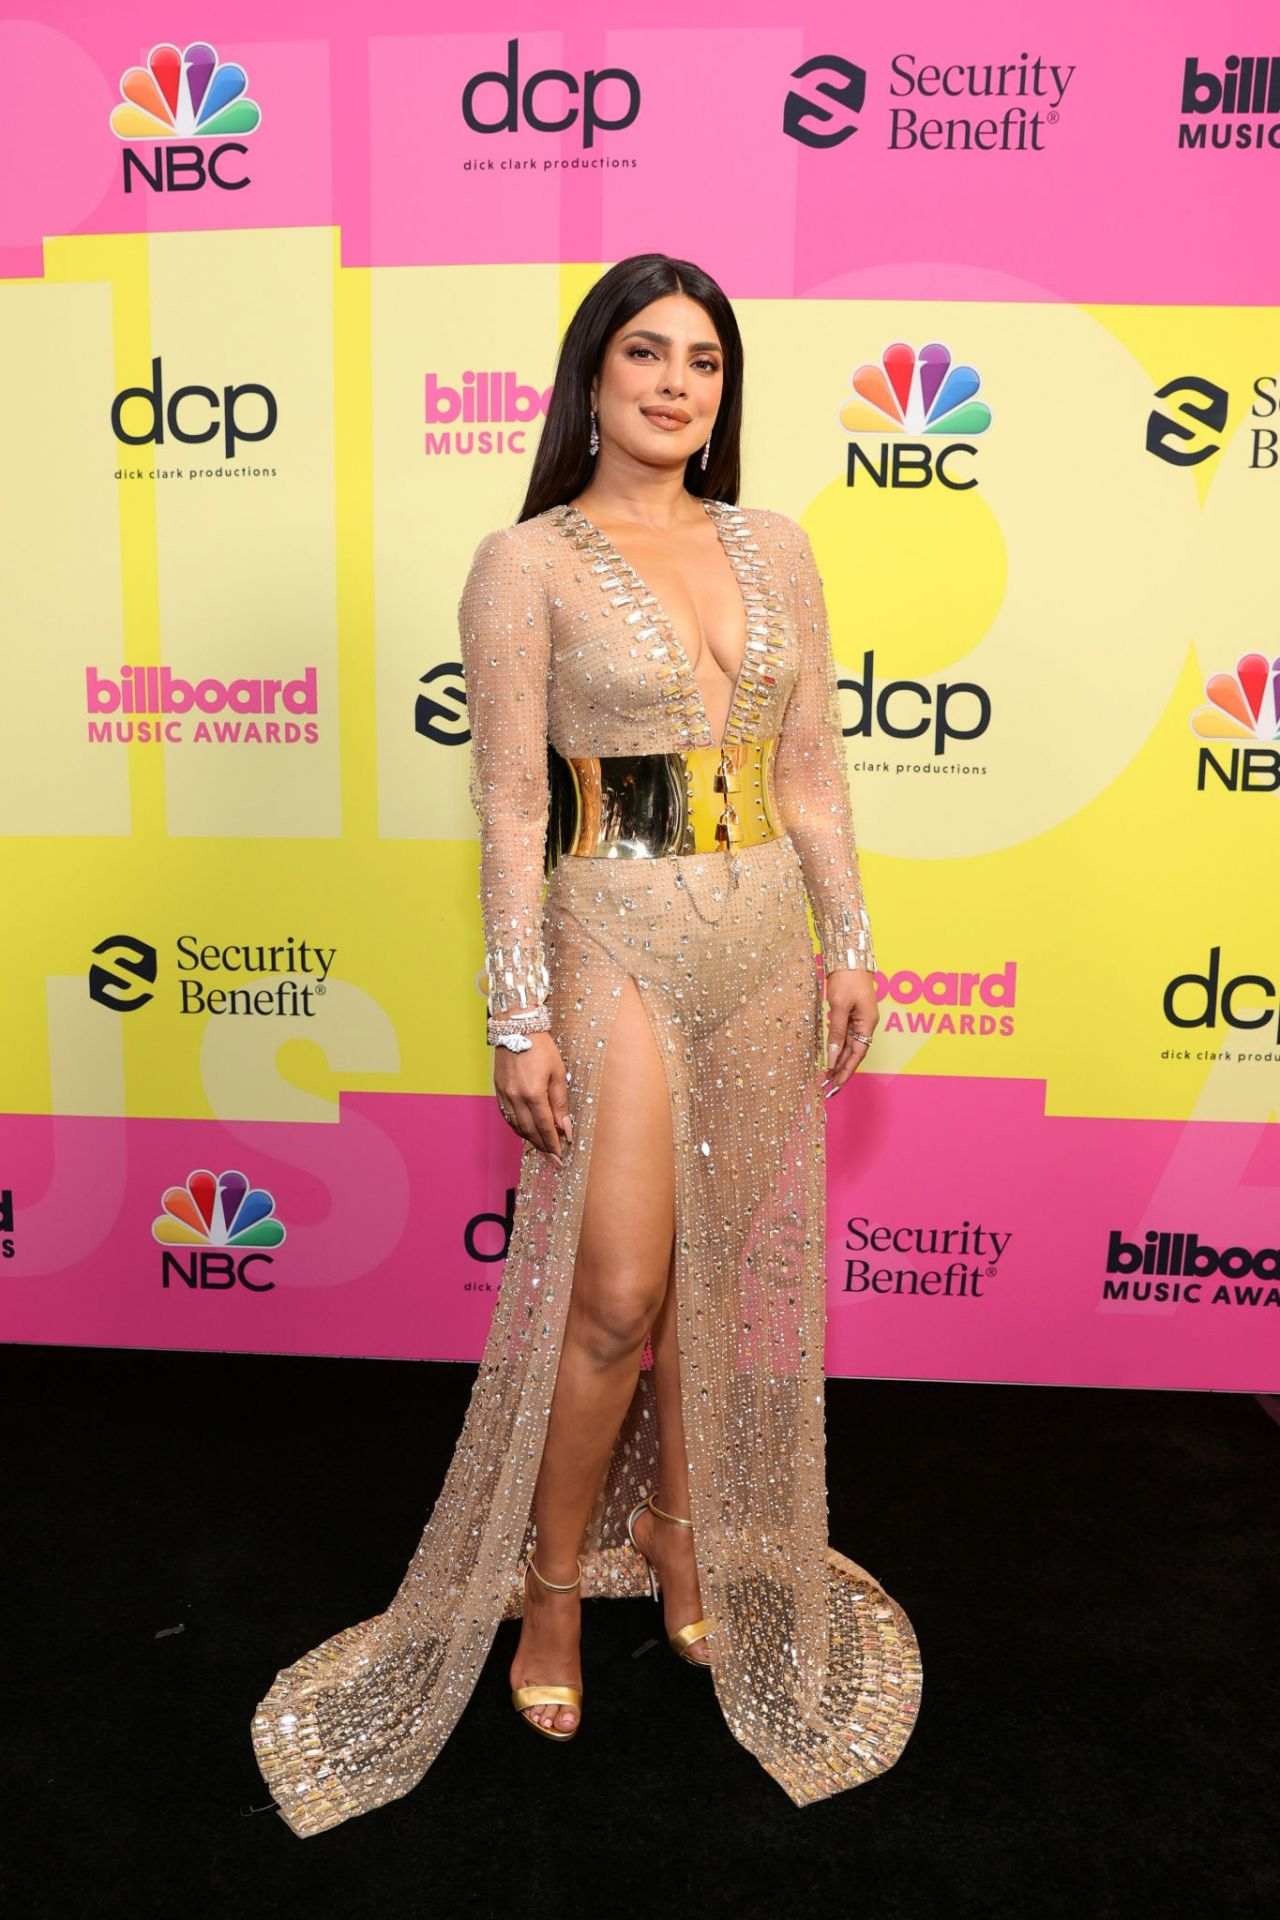 Priyanka Chopra and Nick Jonas - 2021 Billboard Music Awards at the Microsoft Theater in Los Angeles